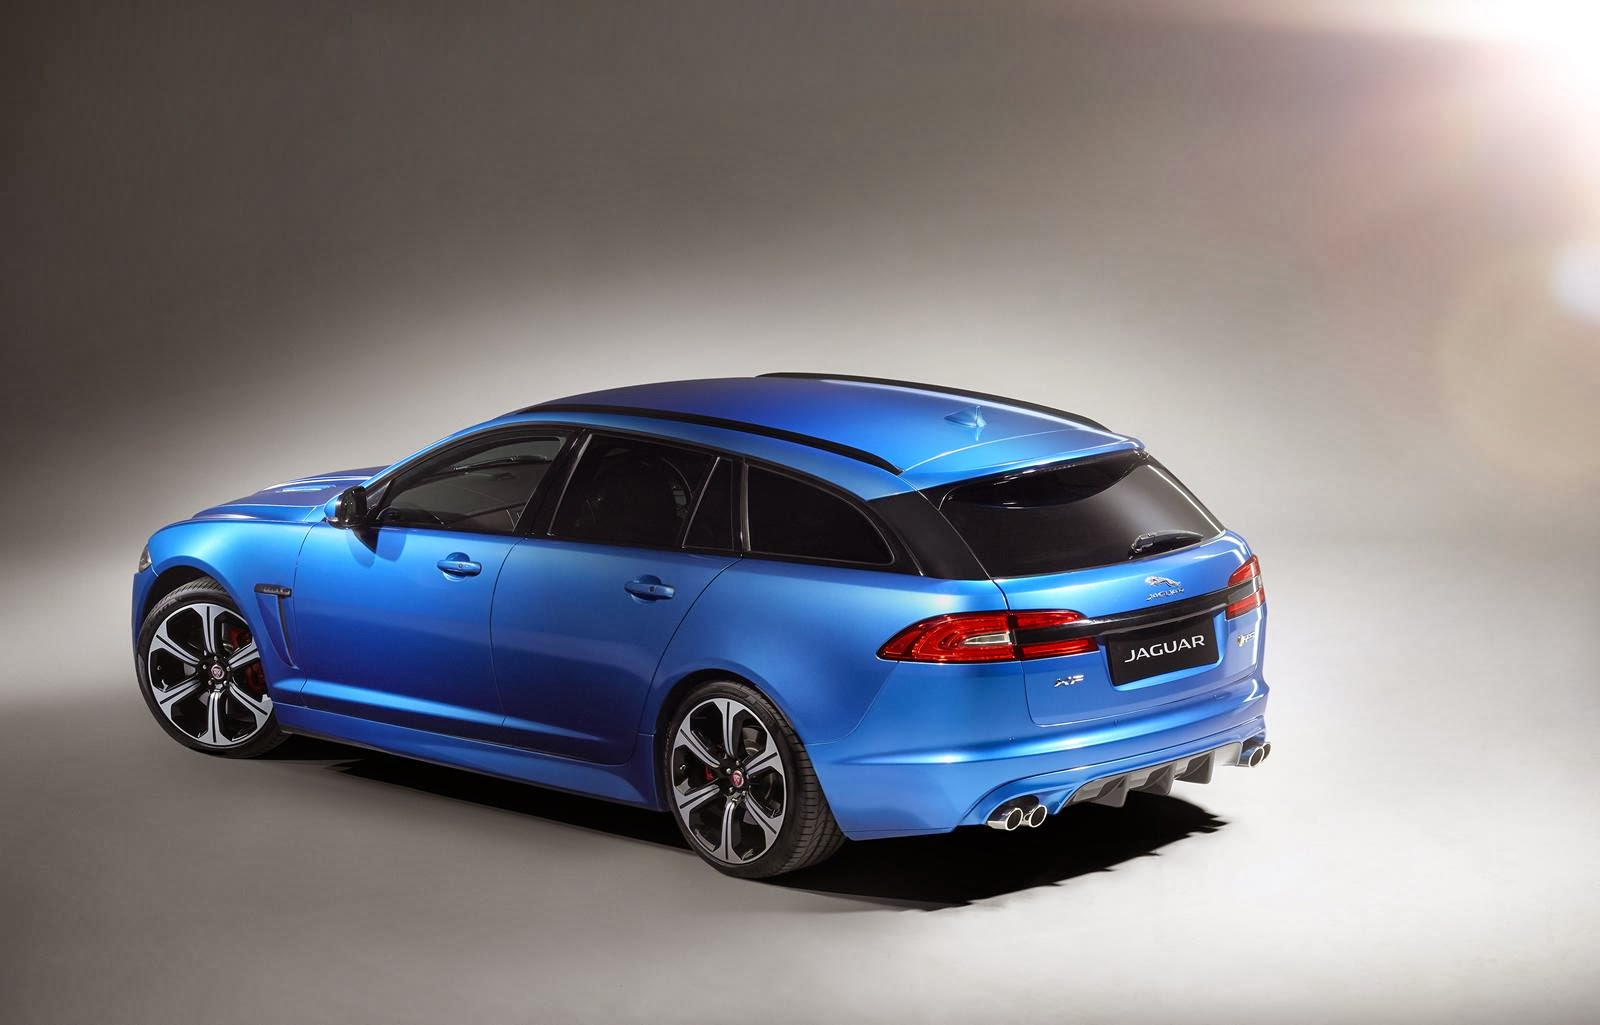 [Resim: Jaguar+XFR-S+Sportbrake+2.jpg]